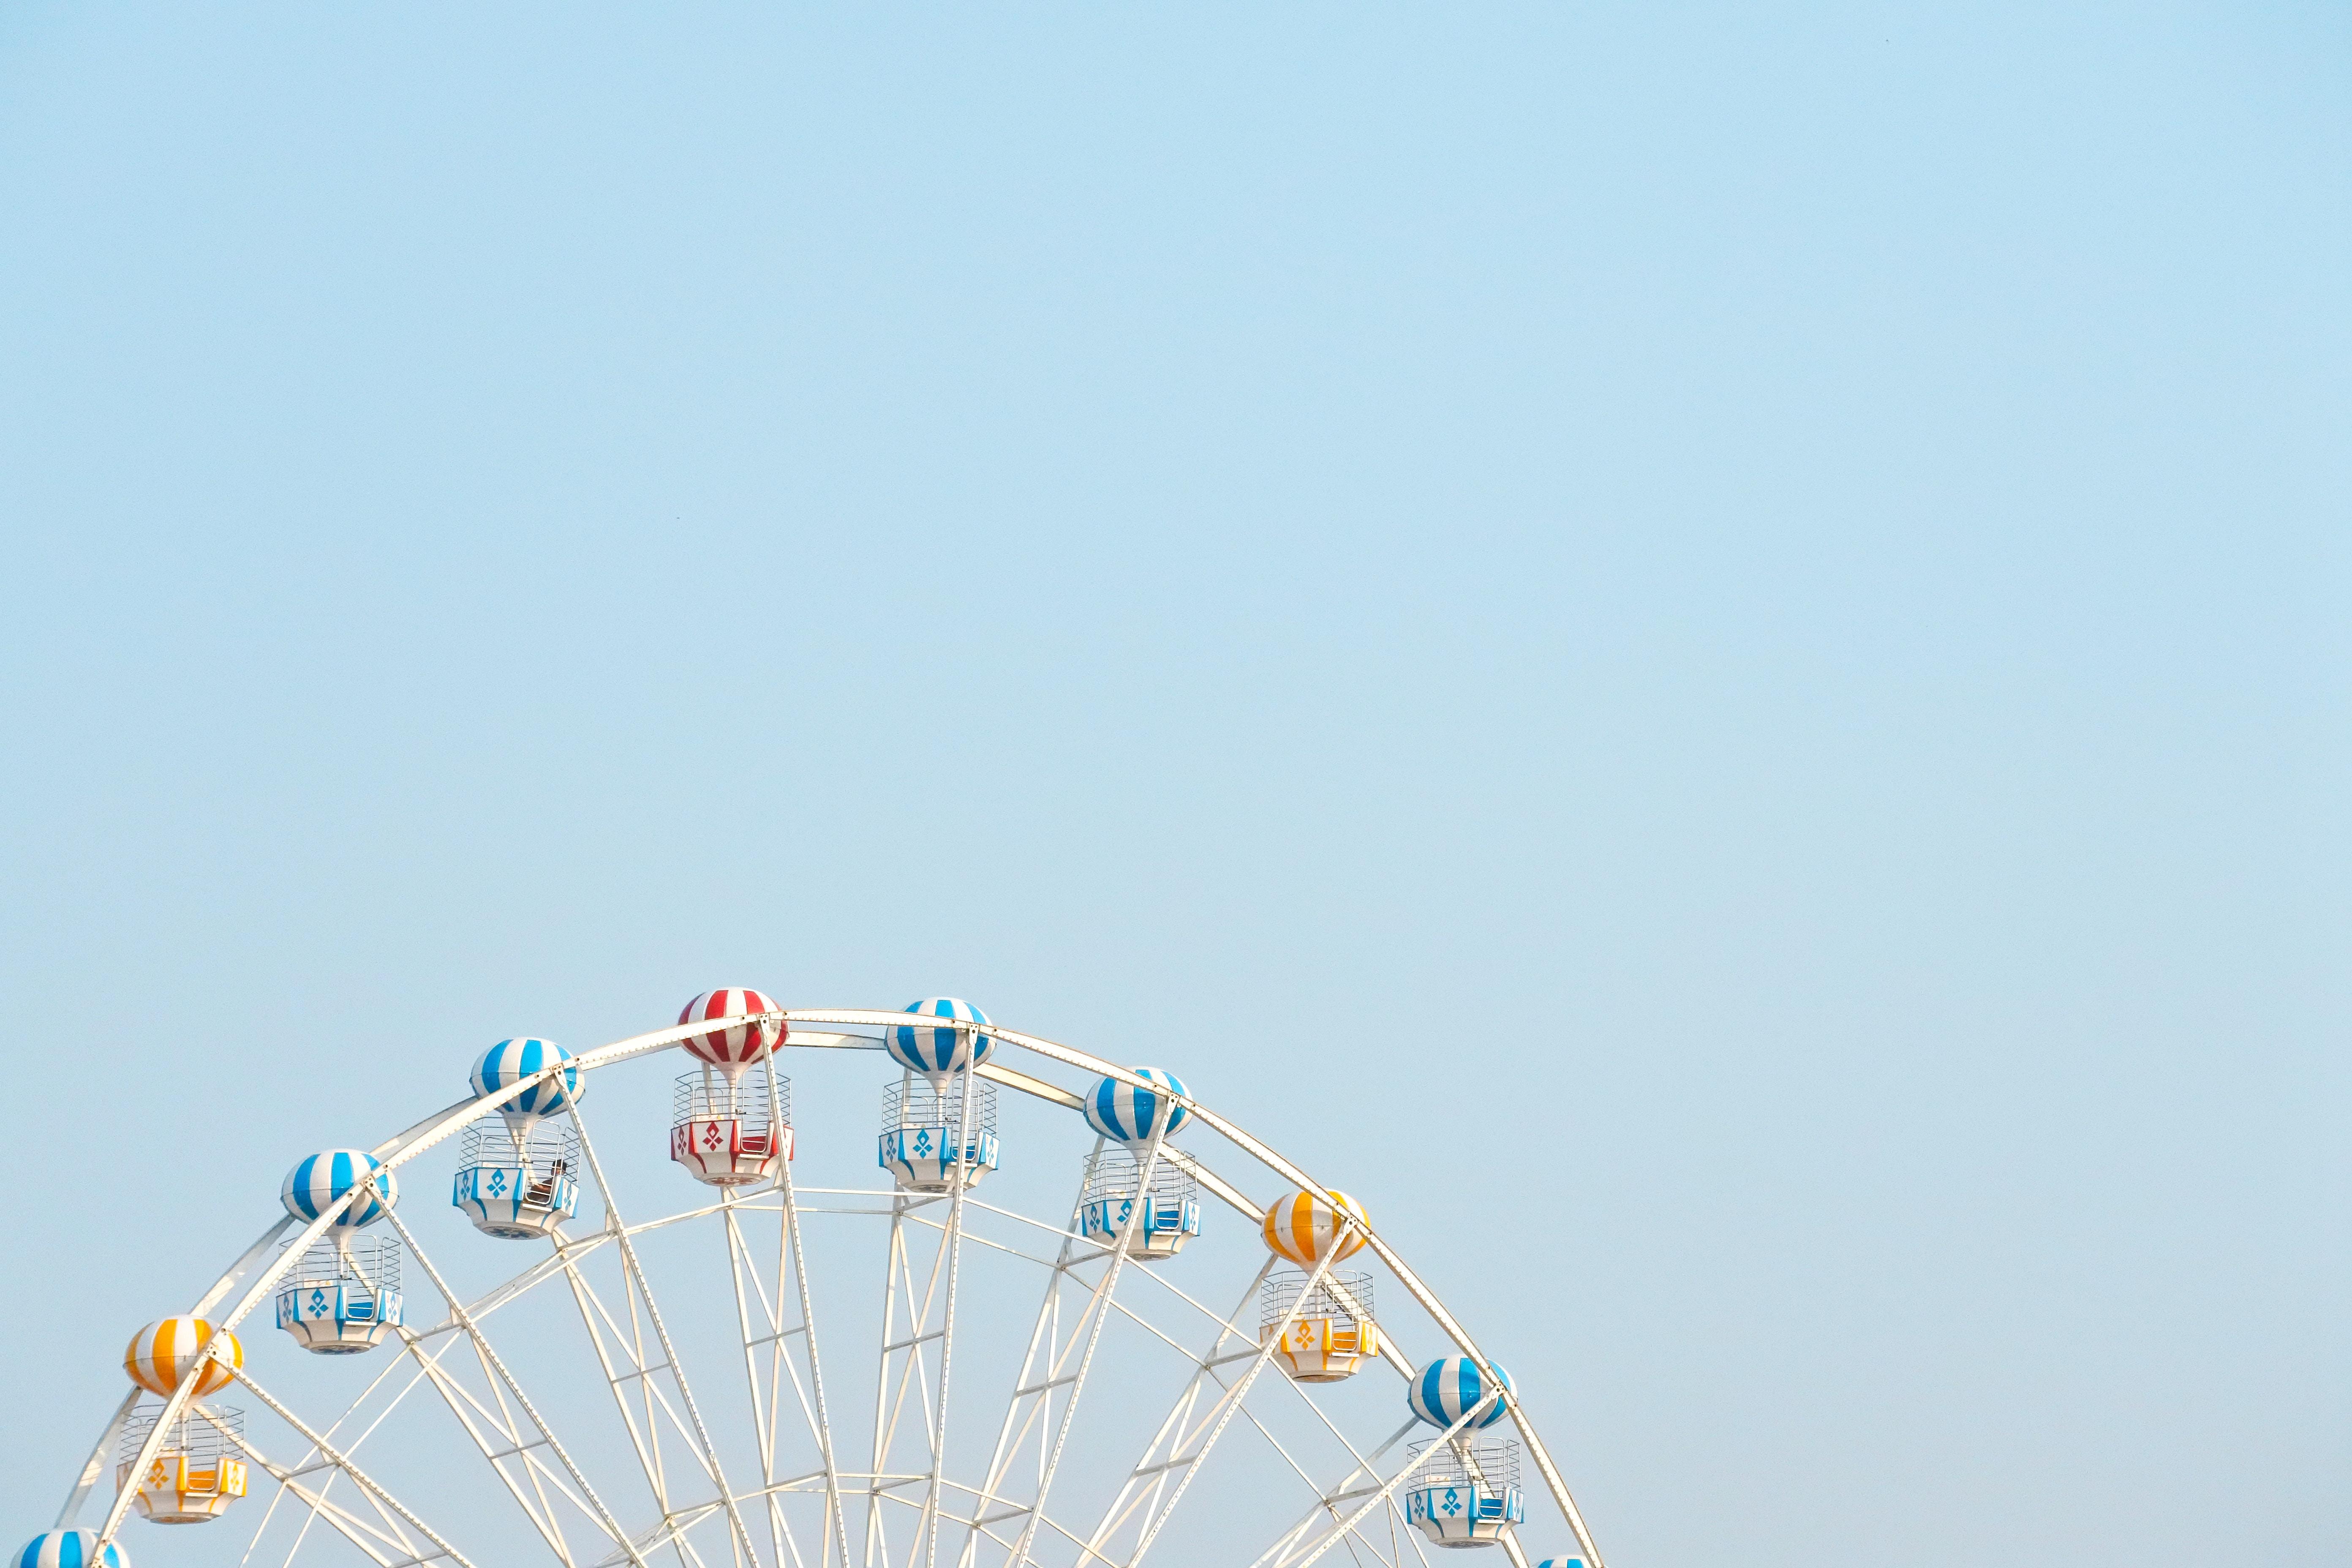 ferris wheel that